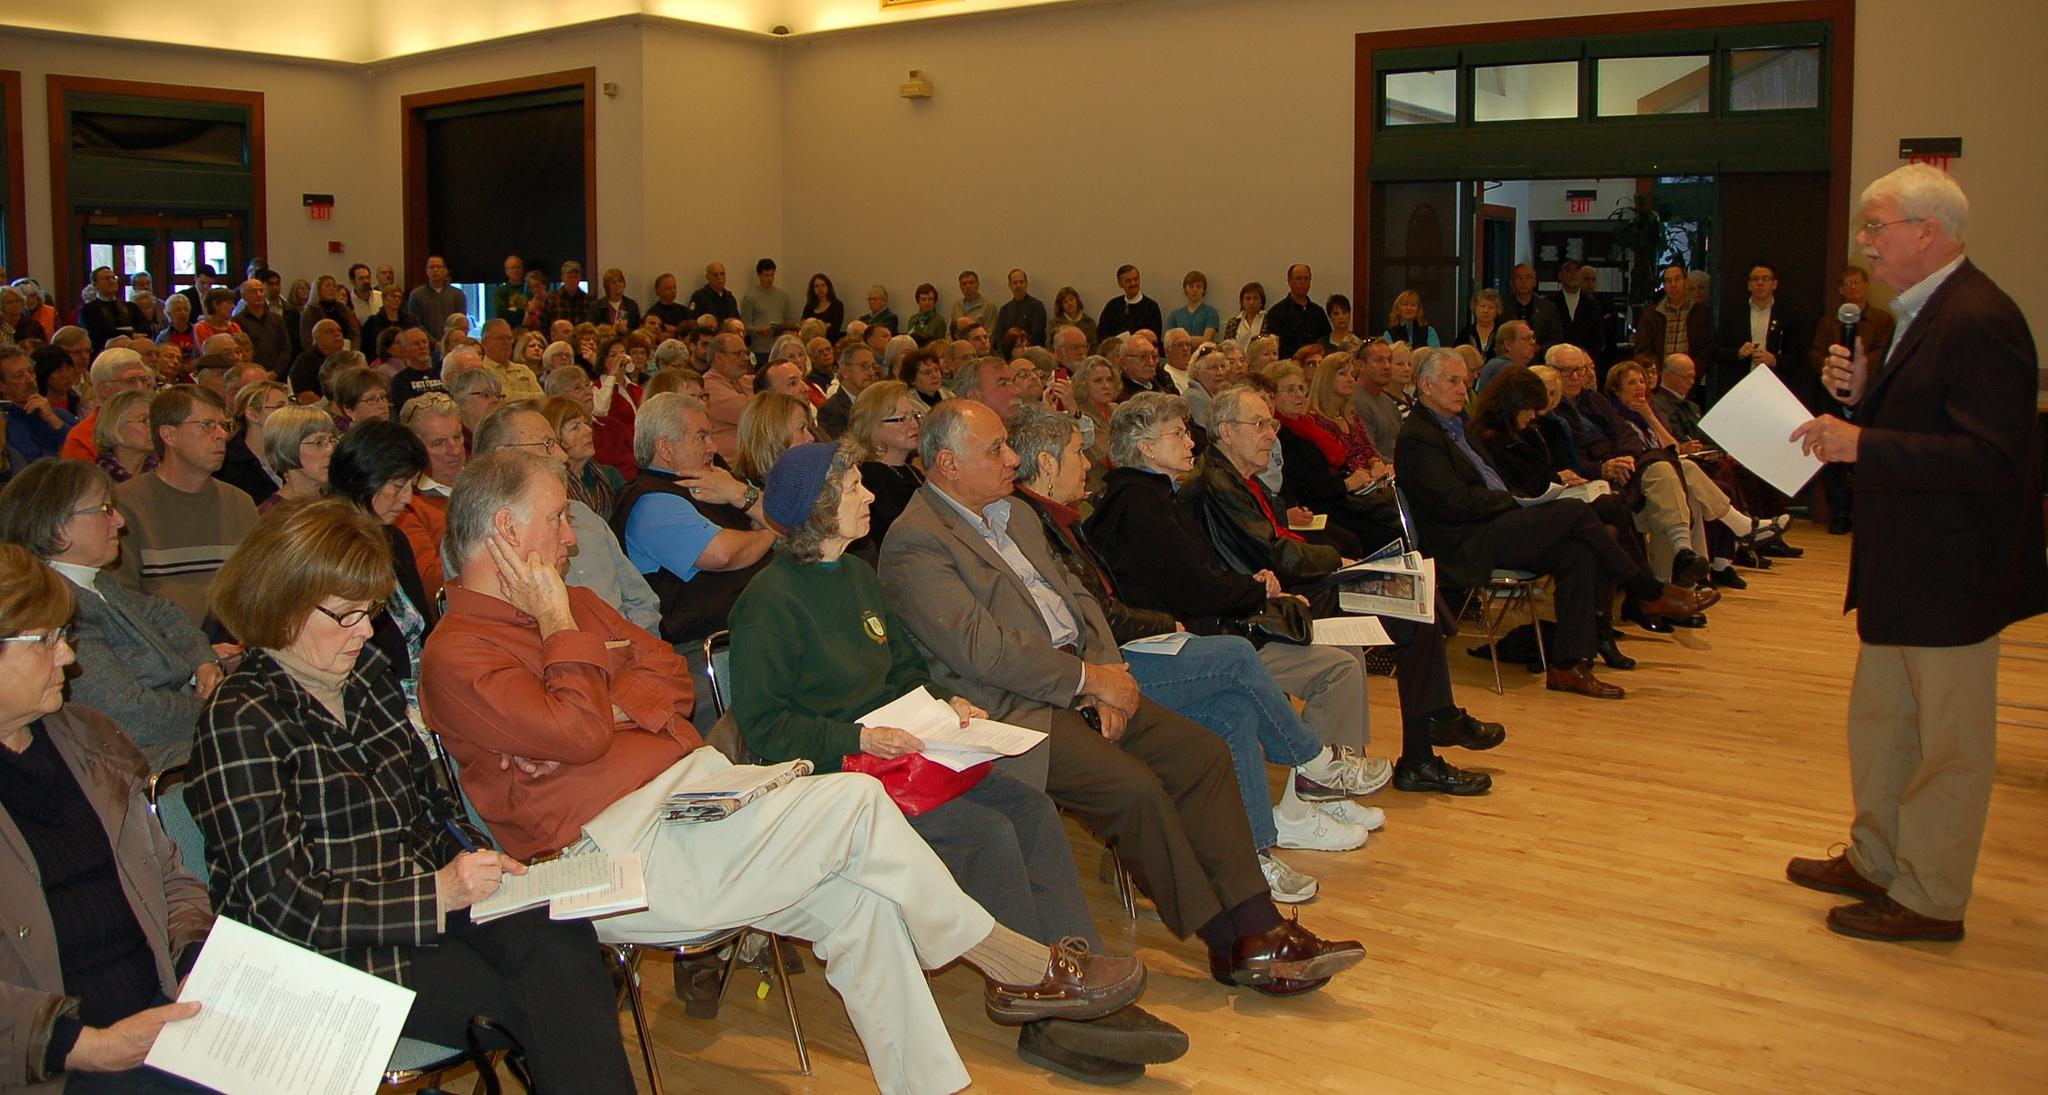 Danville Town Hall Meeting, CA